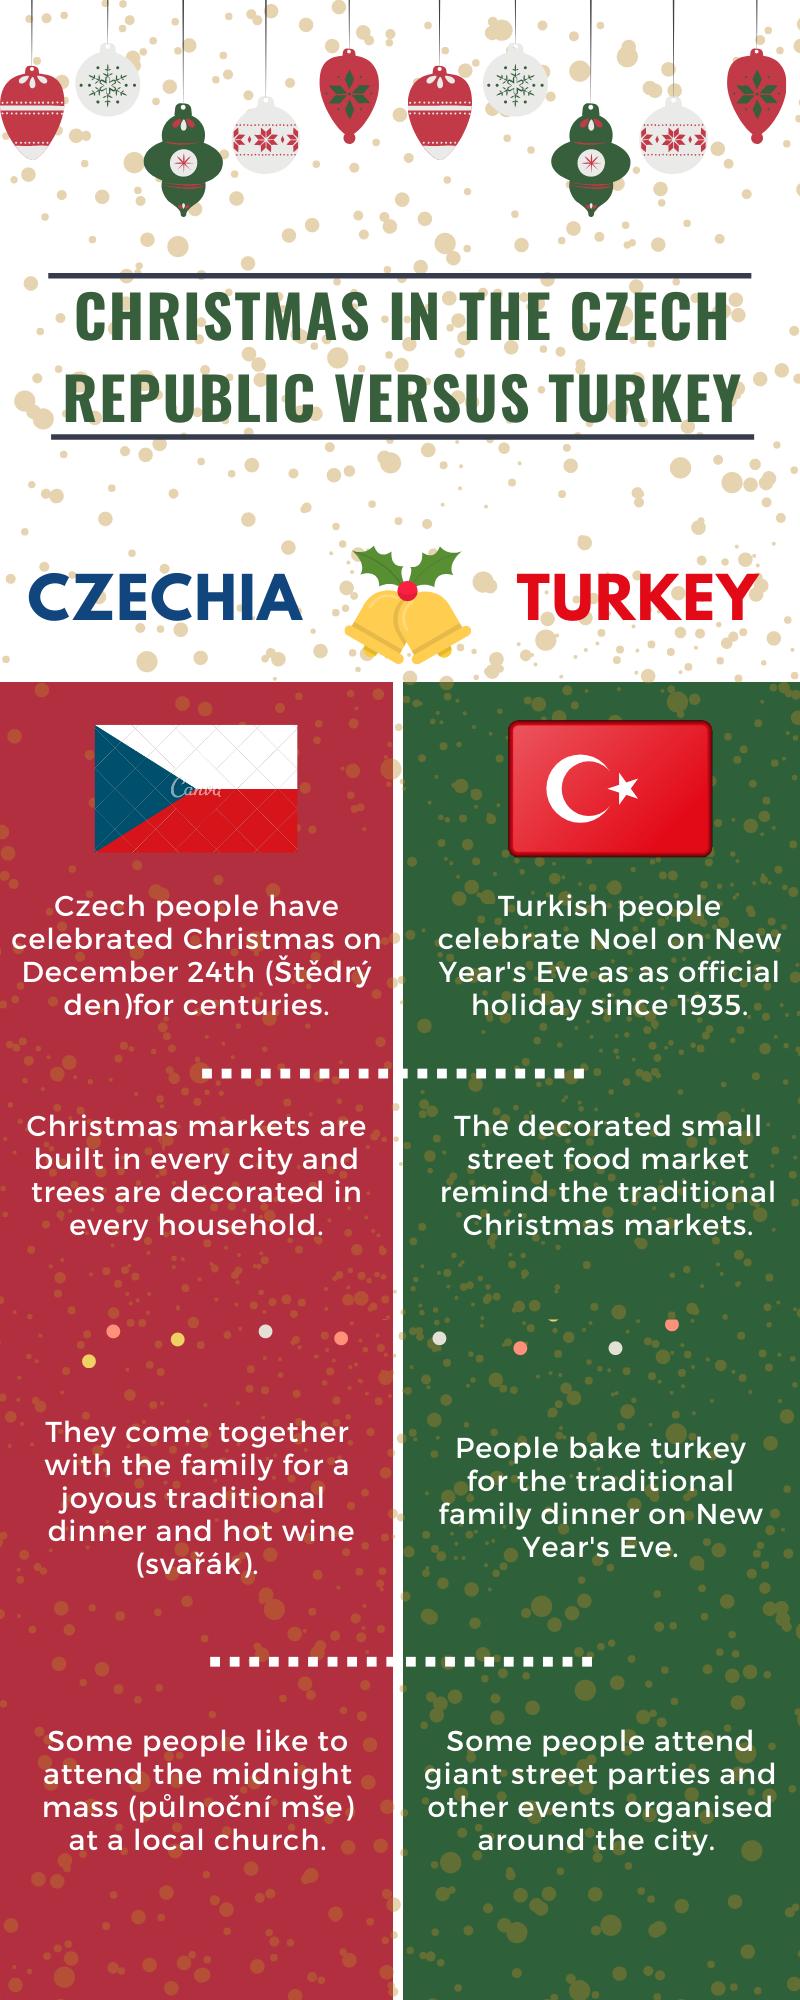 Christmas in Czechia vs. Turkey